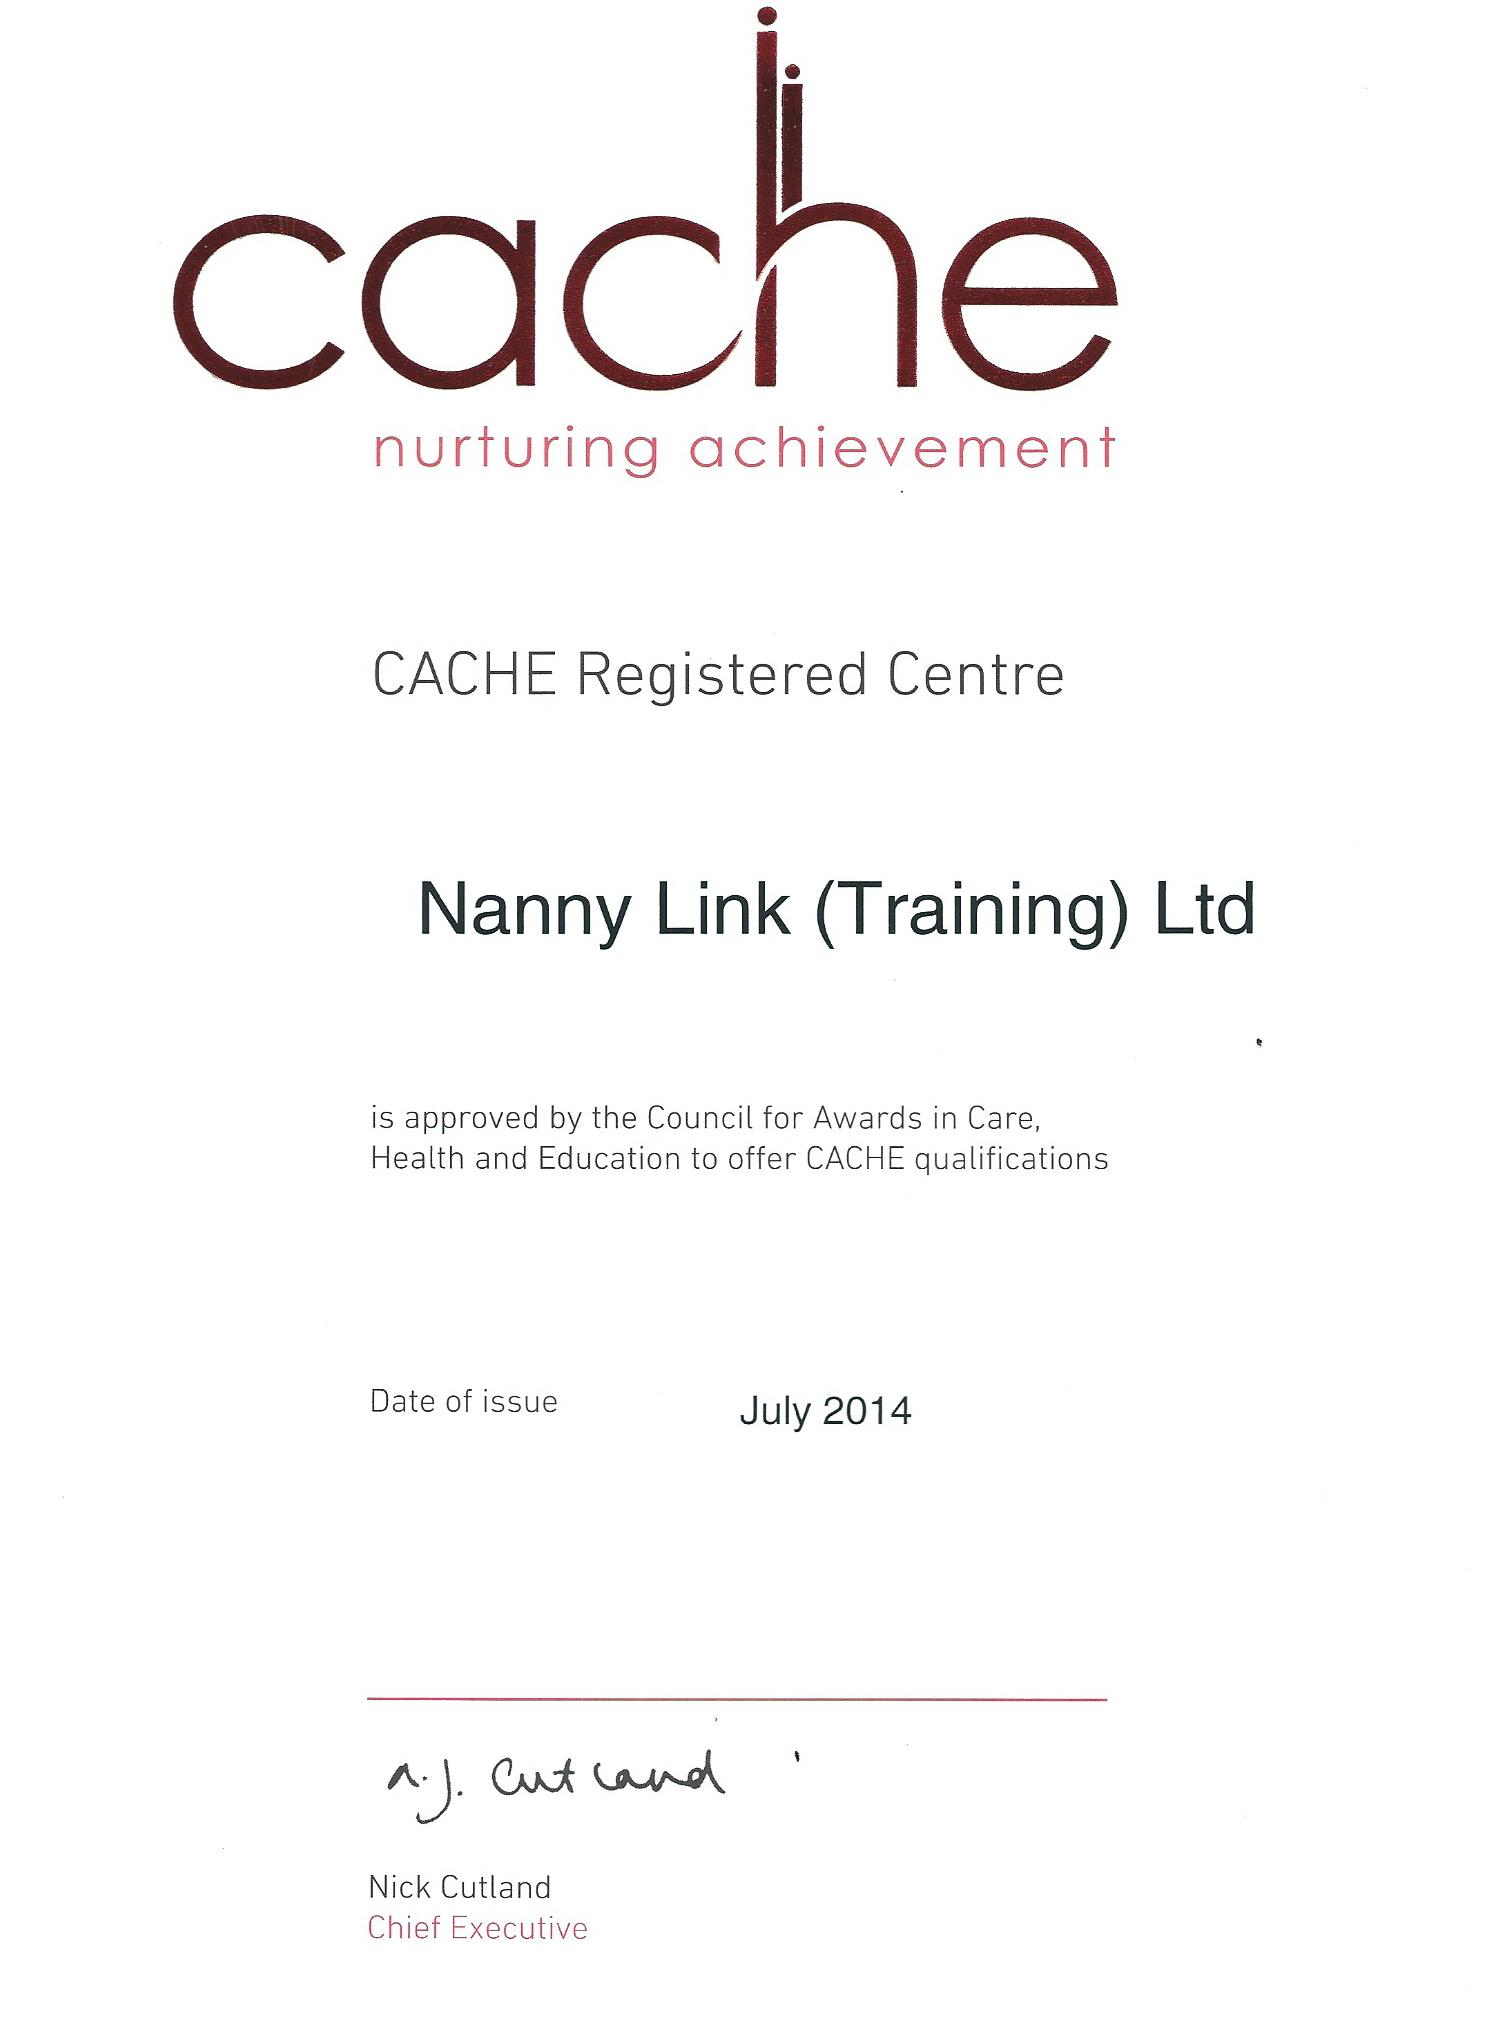 CACHE Certificate